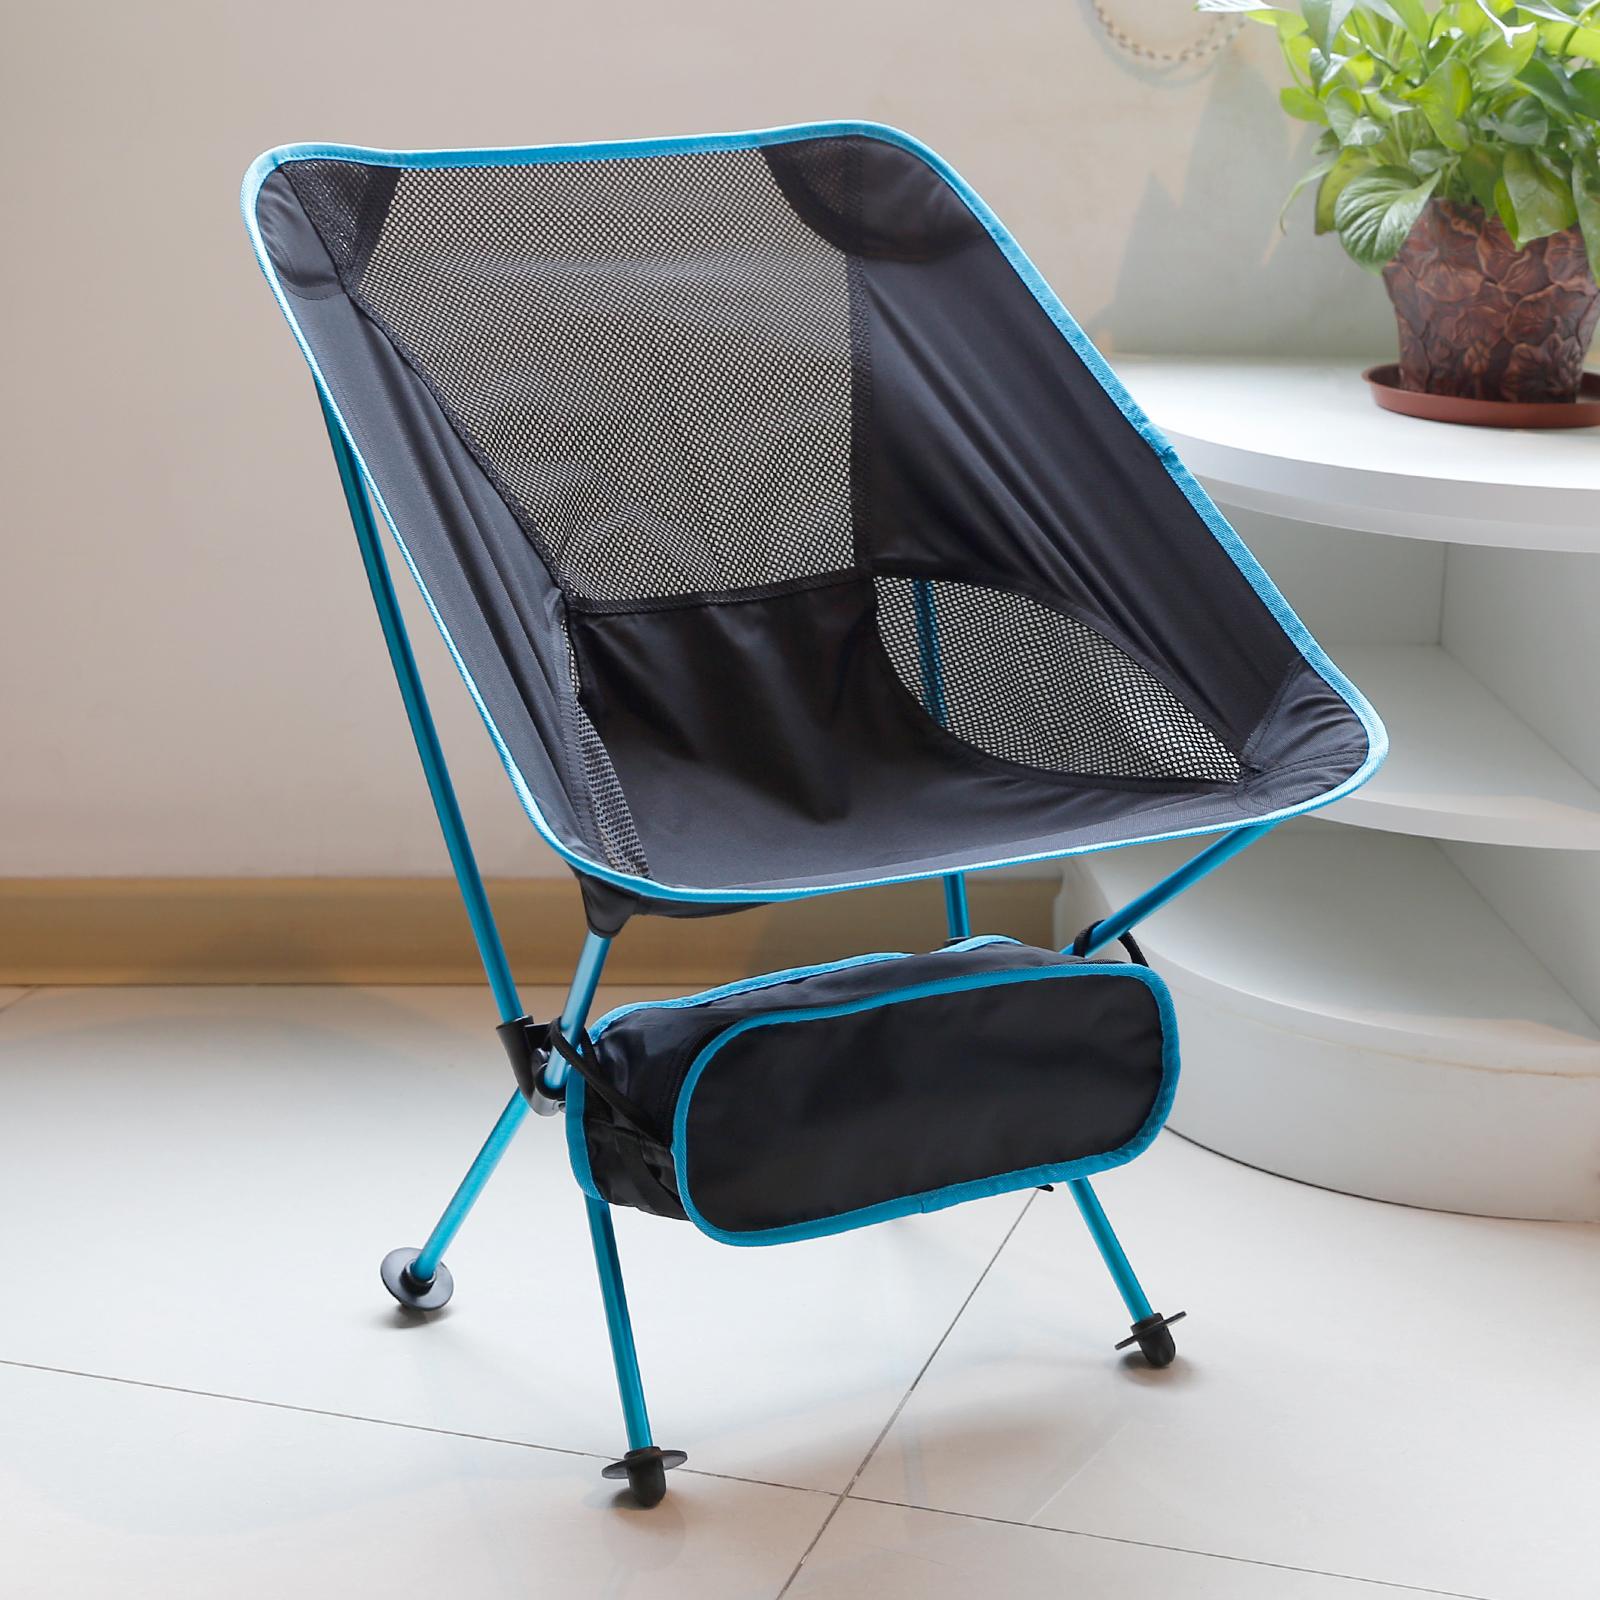 chaise portable pliant si ge de p che camp randonn e. Black Bedroom Furniture Sets. Home Design Ideas